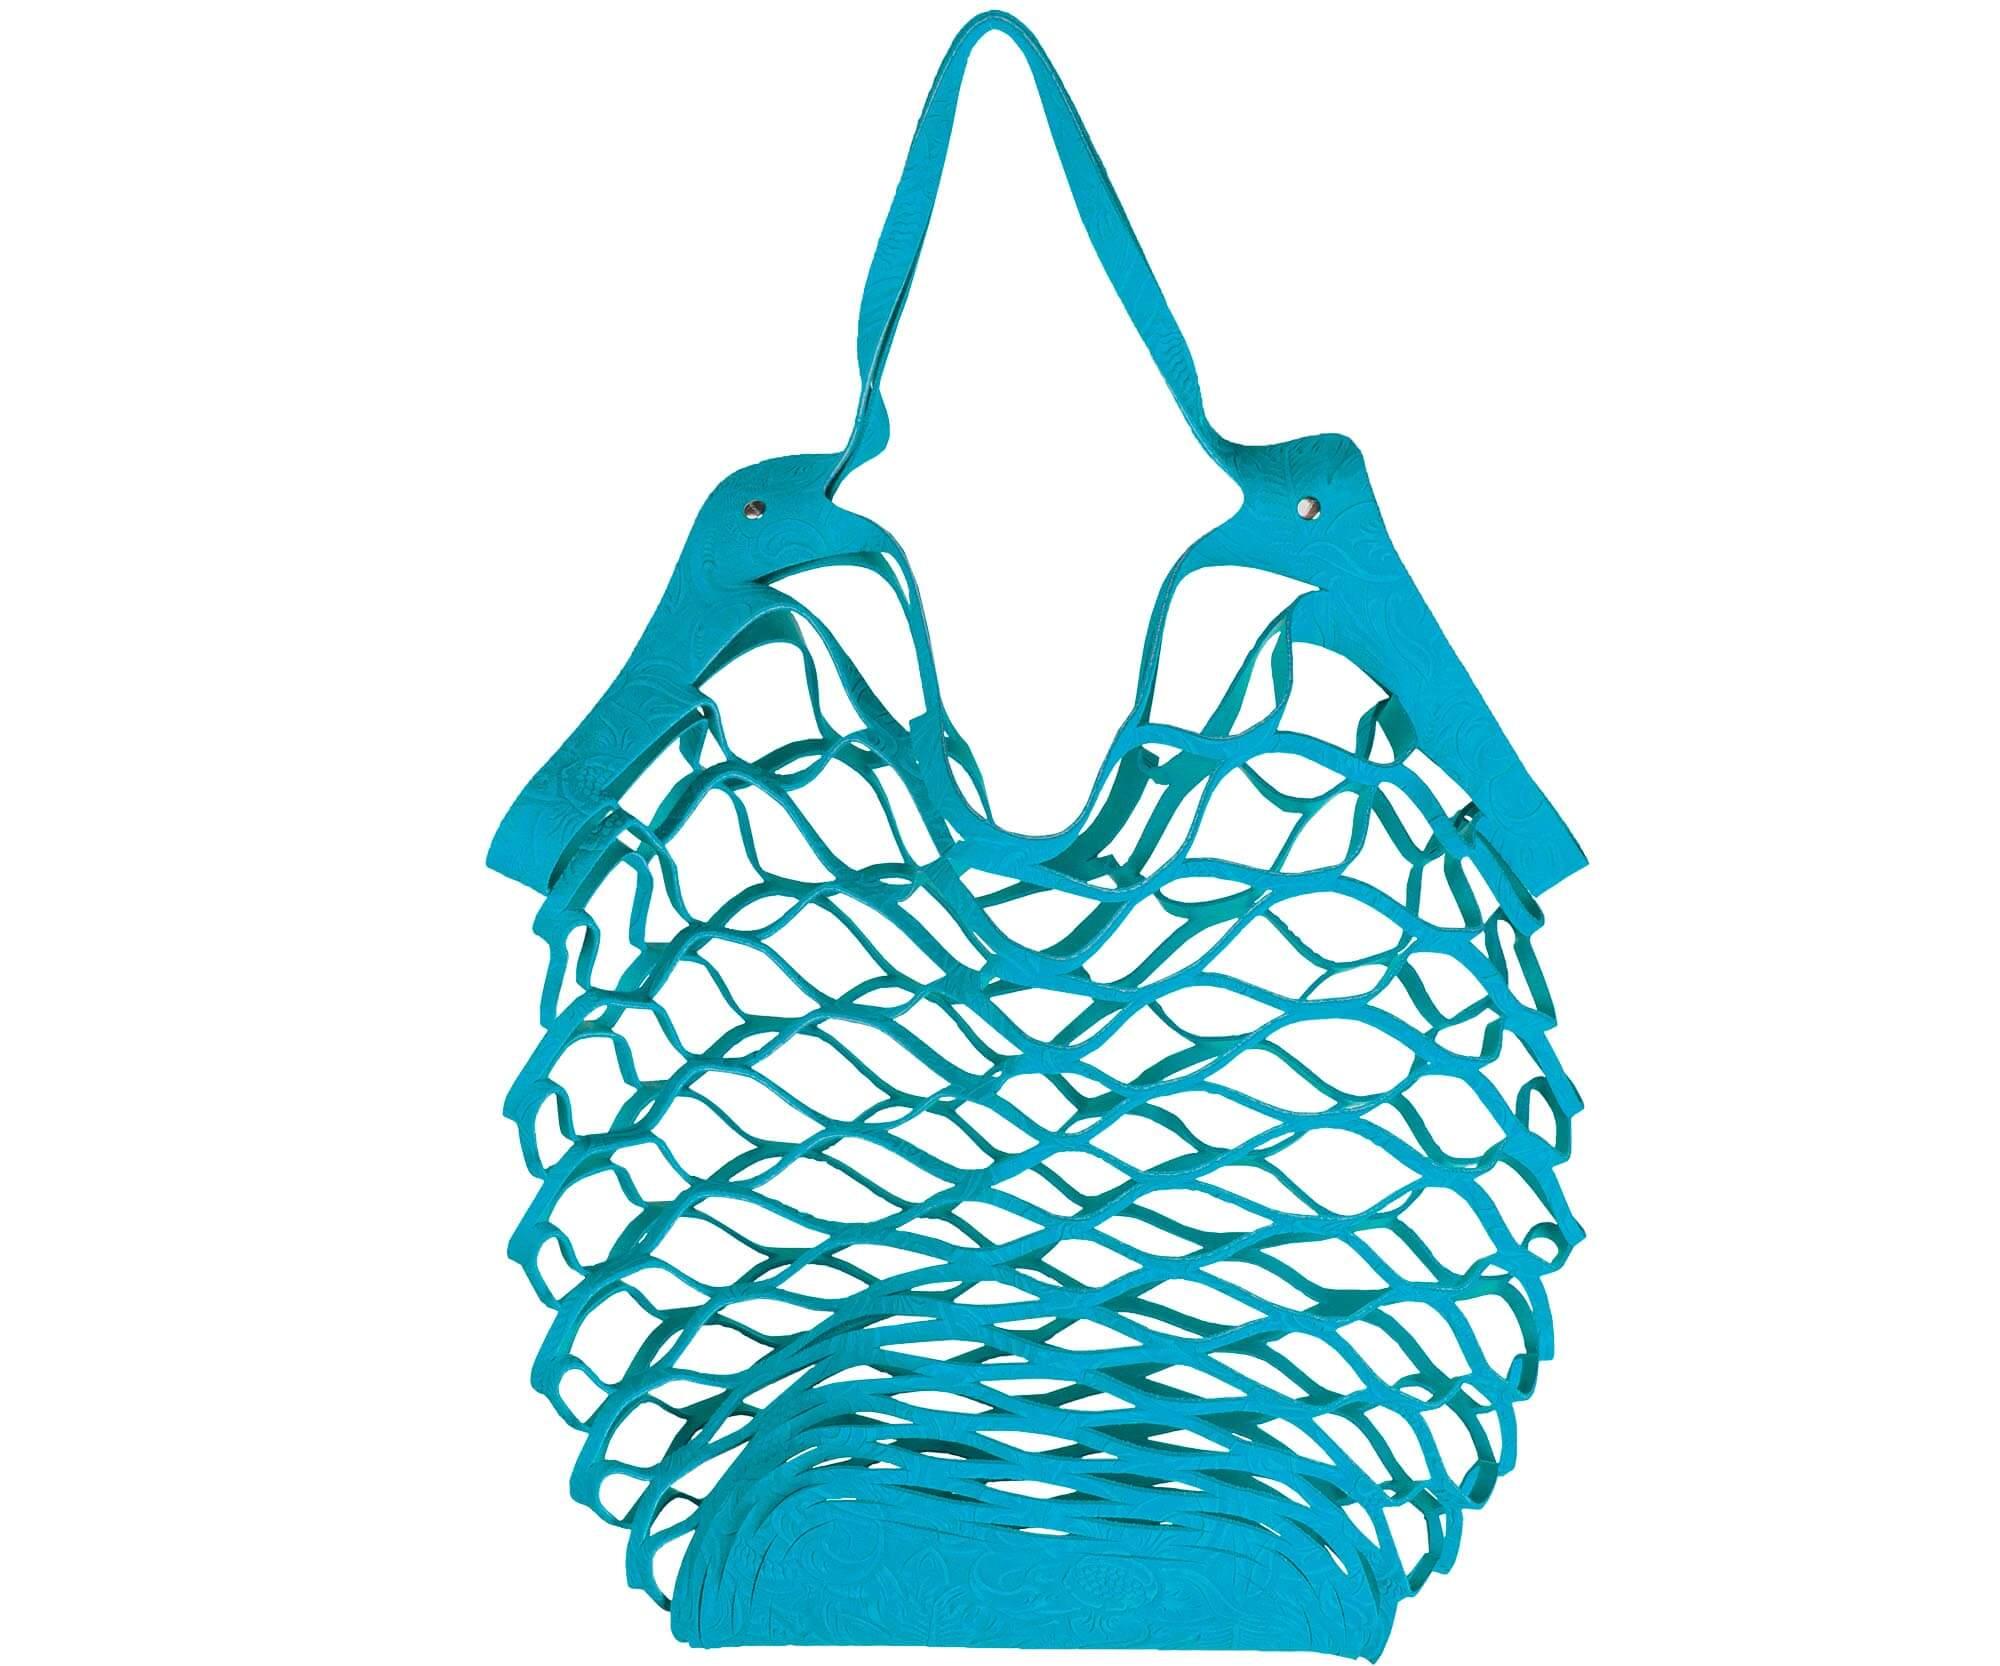 Vanzetti cut out bag blue